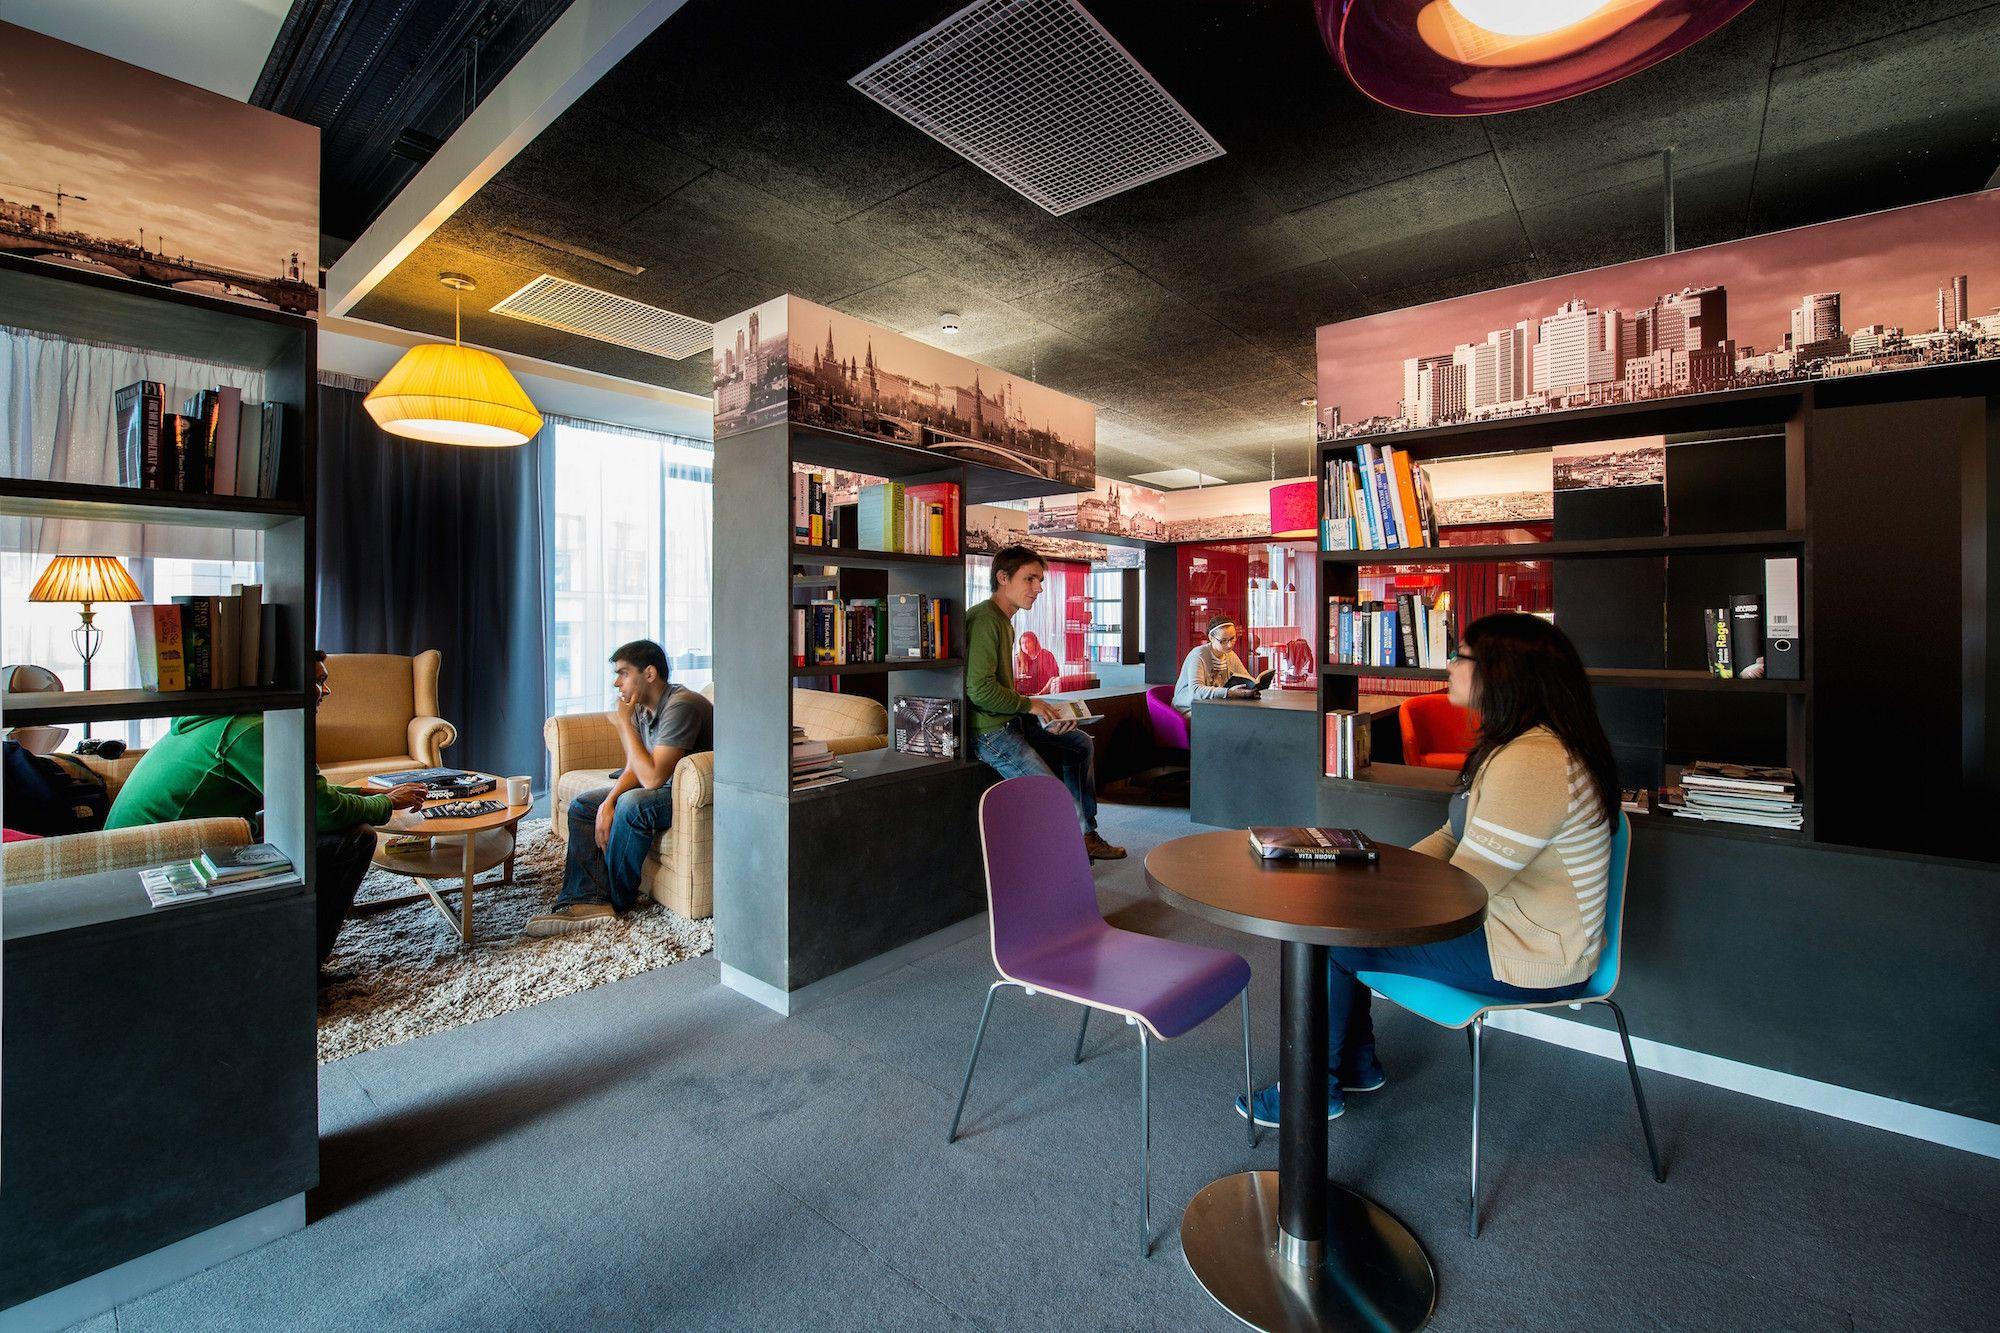 Google campus dublin gasworks library floor identity urbanscape